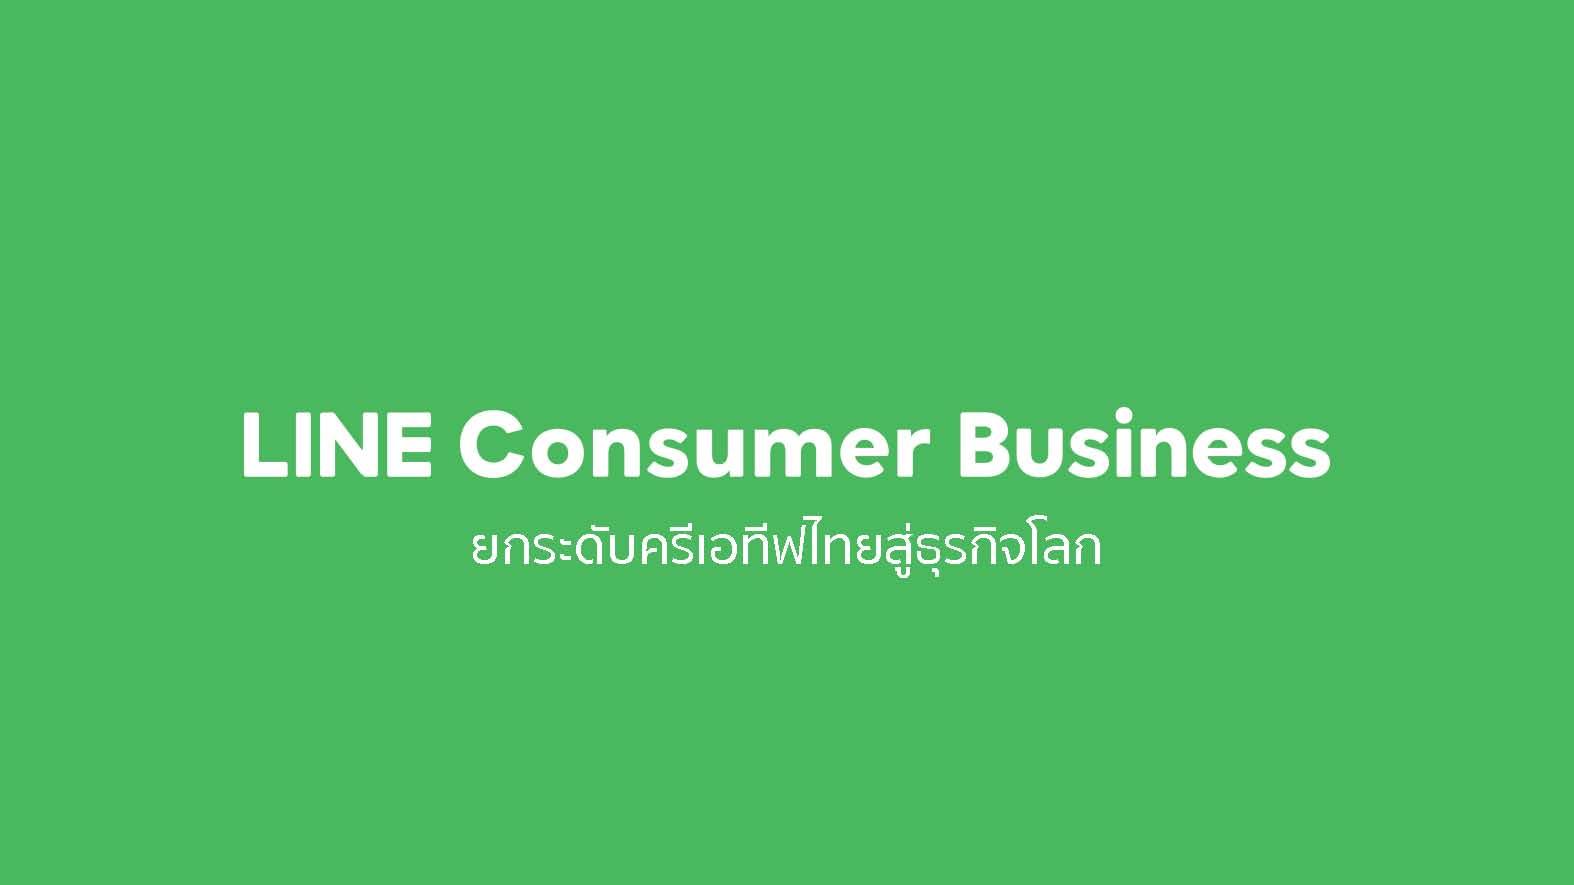 LINE ดันครีเอทีฟไทย เปิดกลุ่มธุรกิจ LINE Consumer Business ชู LINE STICKERS, LINE MELODY และ LINE ดูดวง